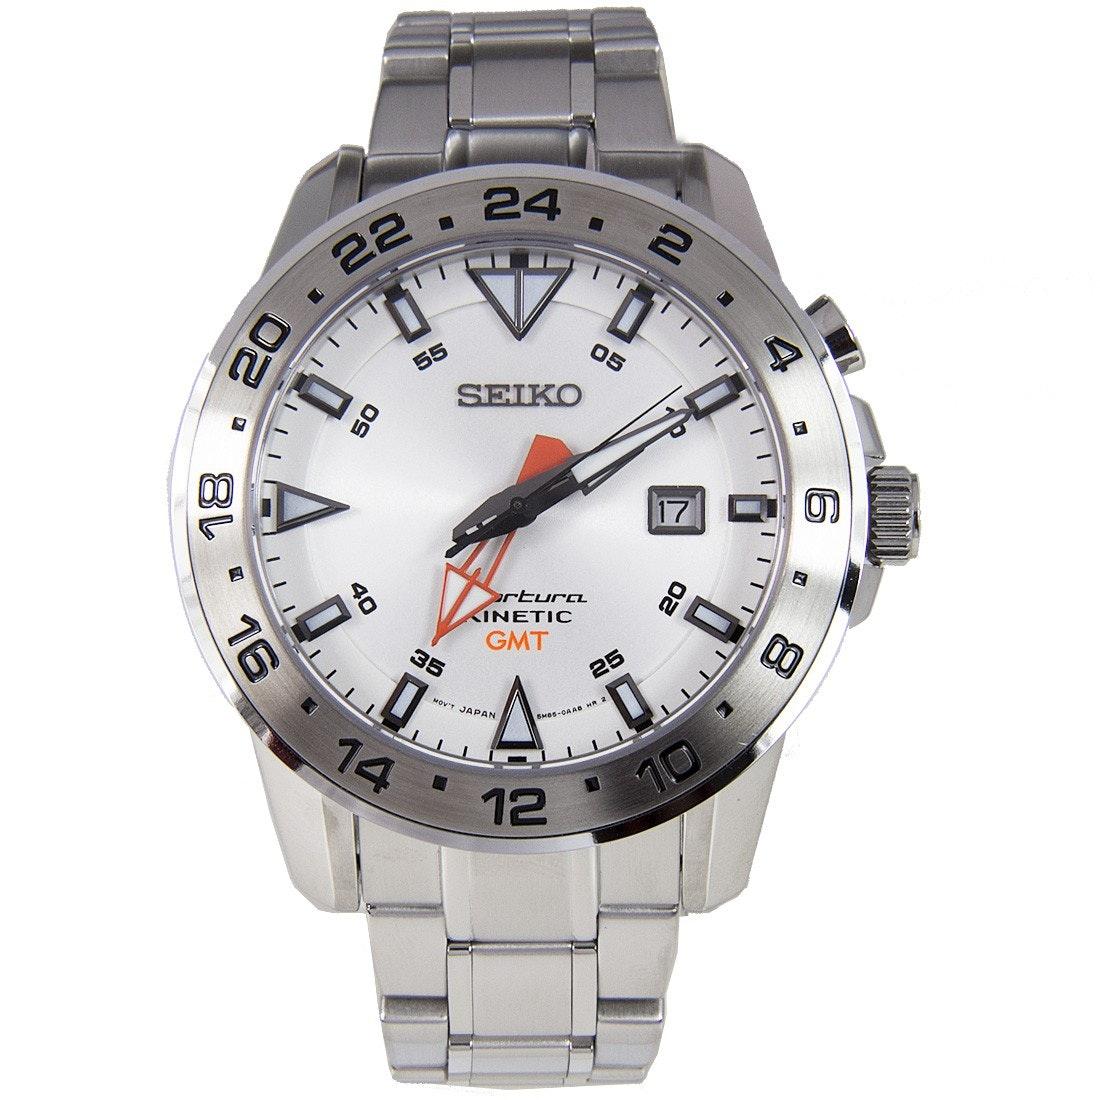 Seiko Sportura Kinetic GMT Watch SUN025P1 SUN025P